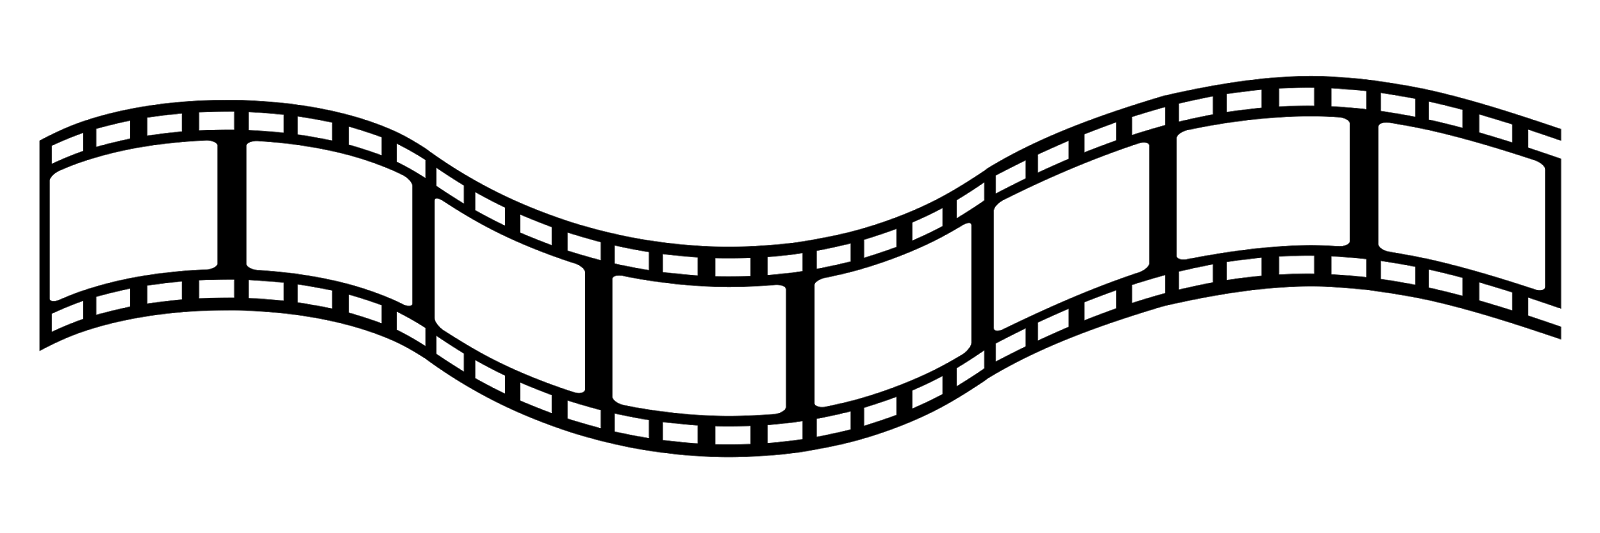 Film Strip Vector Clipart